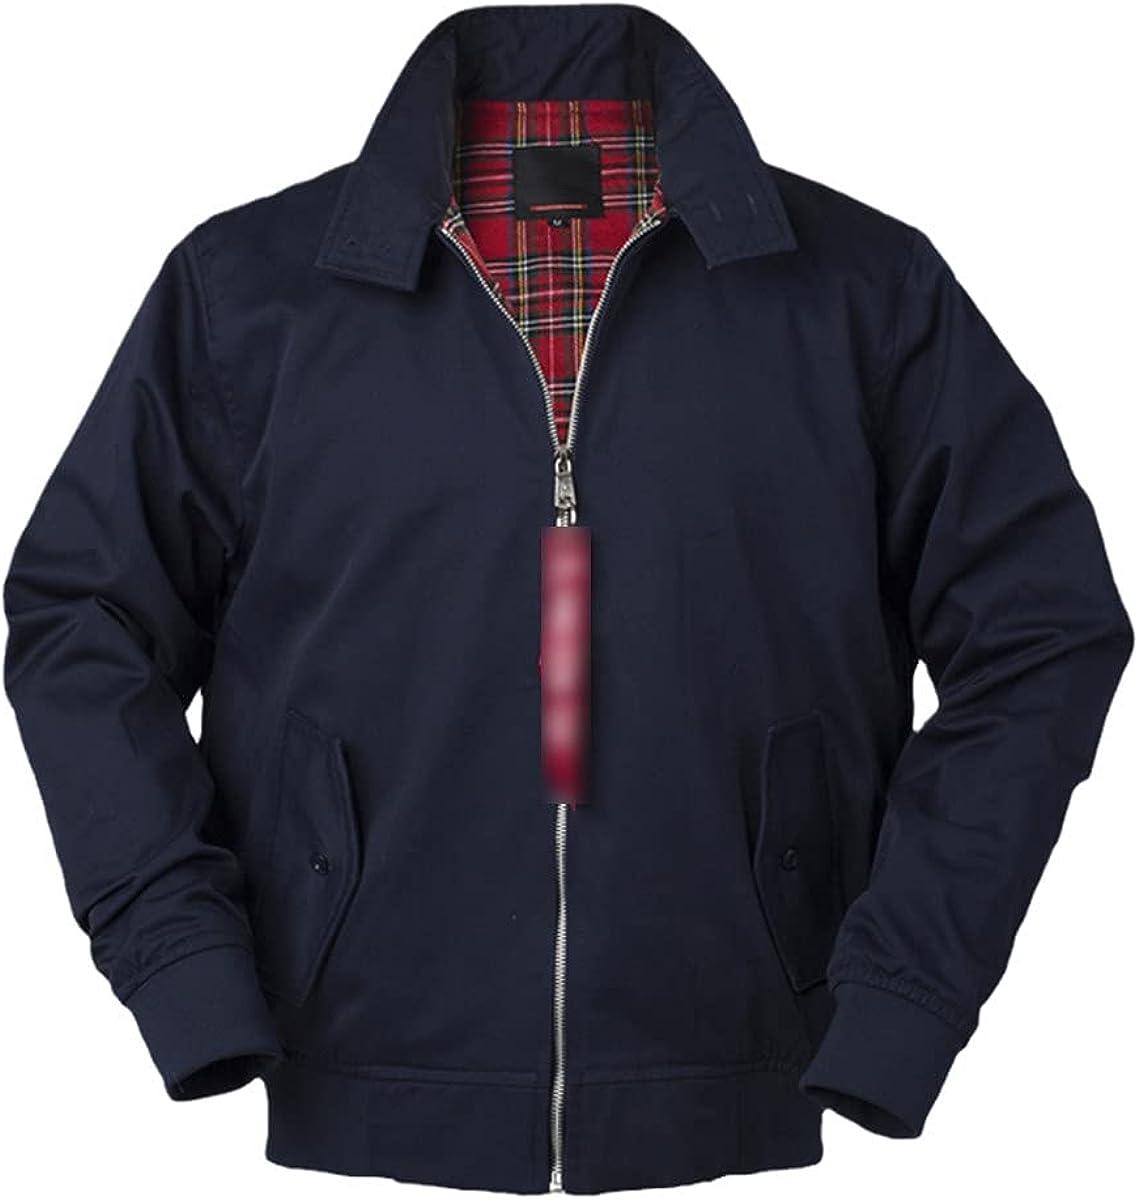 European Solid Color Classic Retro Bomber Jacket Men's Windbreaker Street Style Fashion Jacket